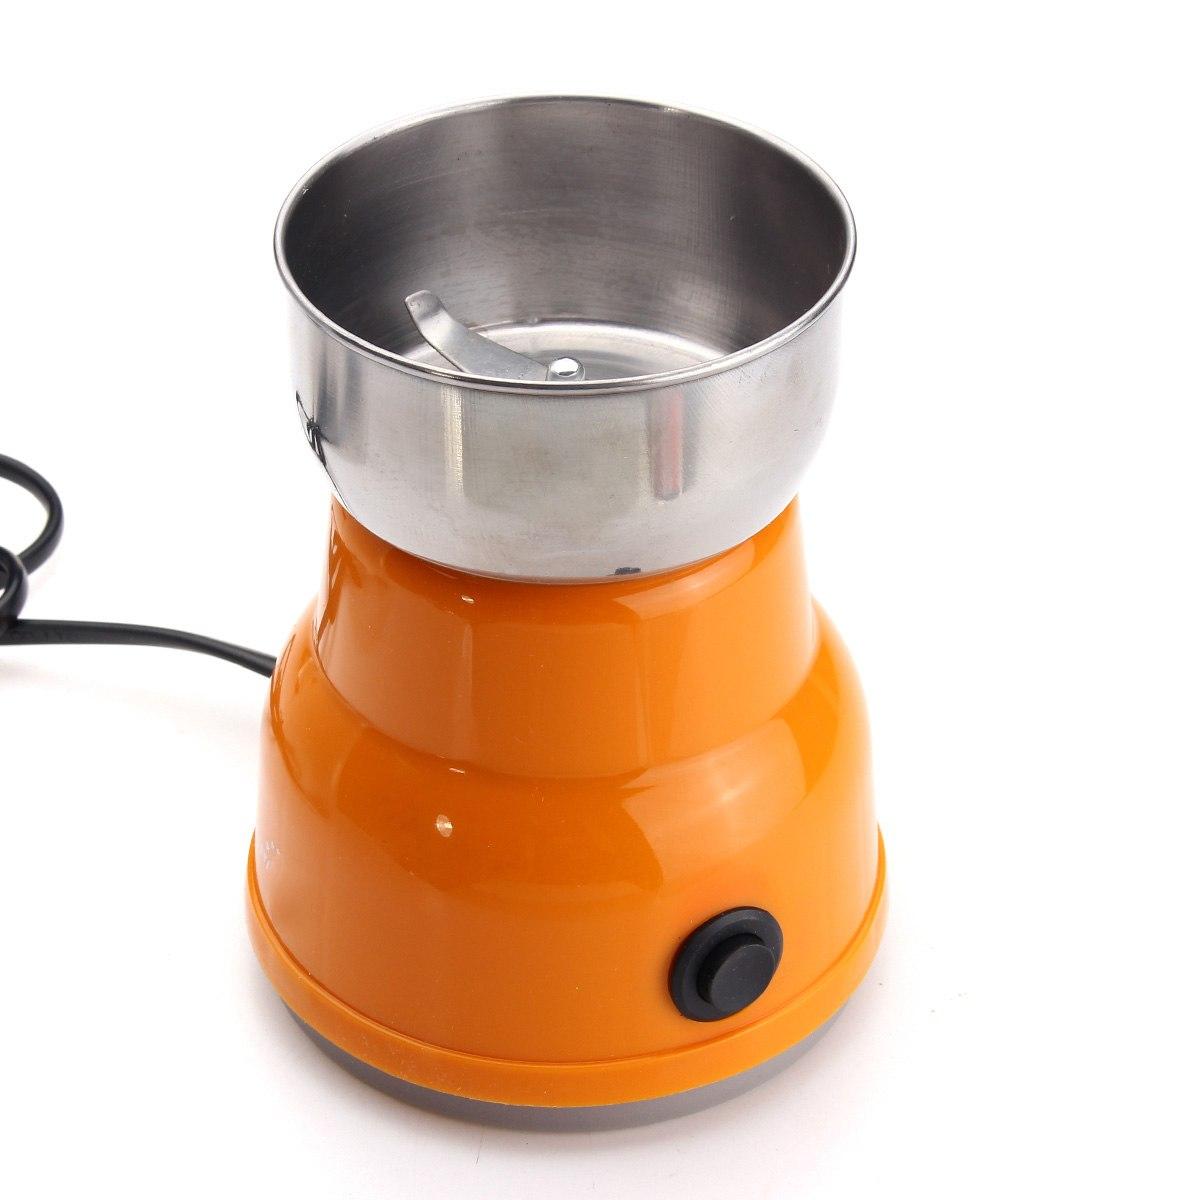 1Pcs Auto-manual Coffee grinder Machine EU Plug